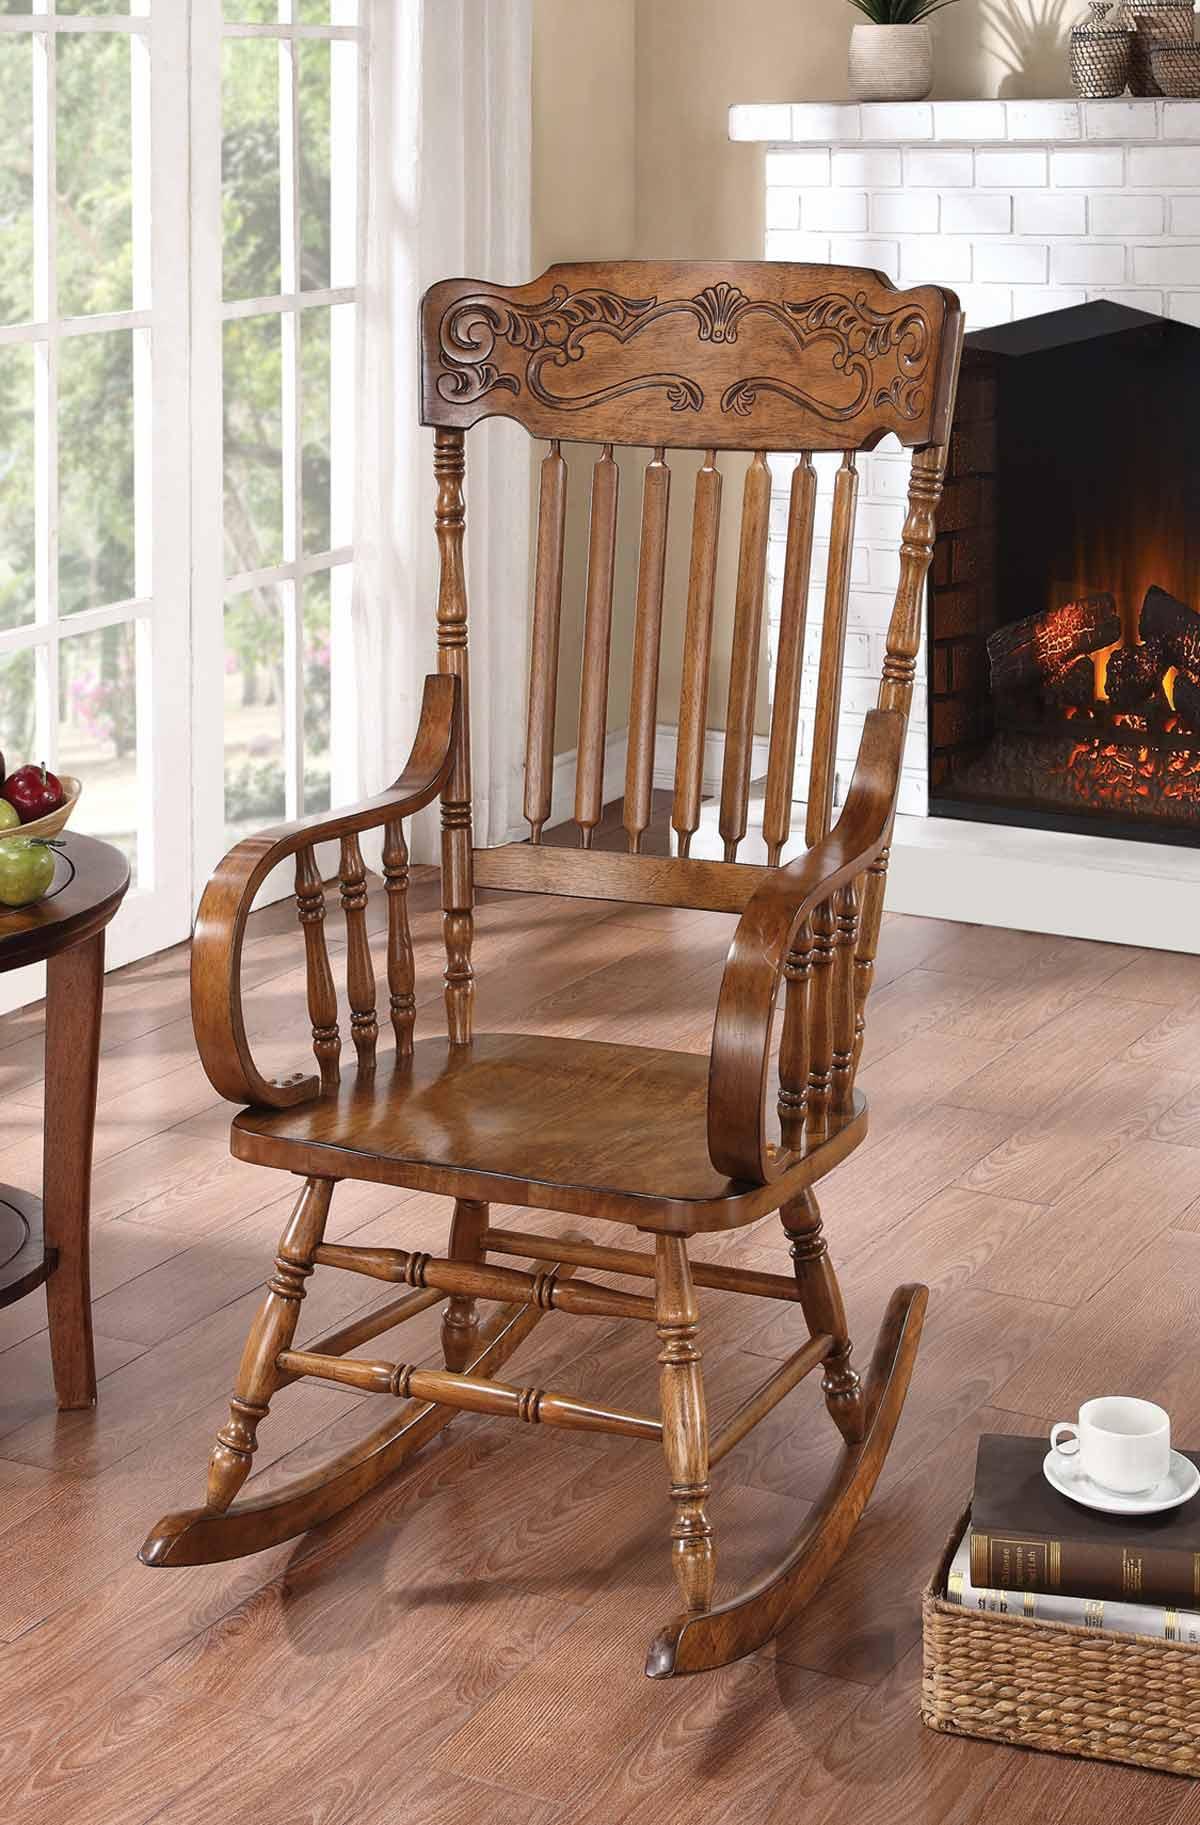 Coaster 600175 Rocking Chair - Warm Brown